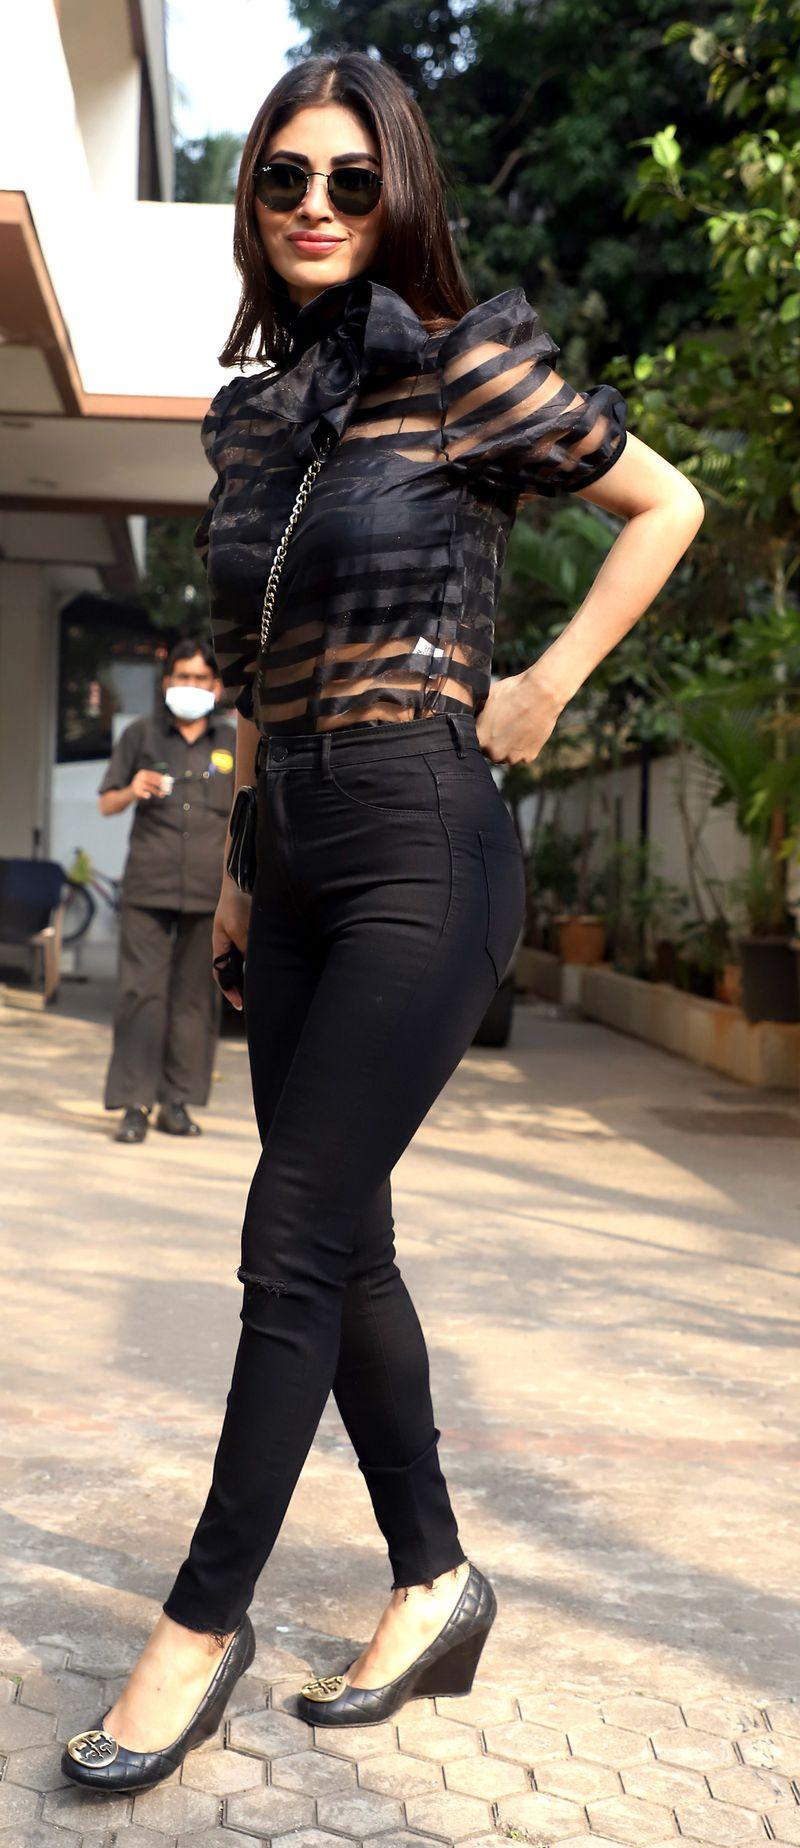 Maharashtra, Feb 25 (ANI): Bollywood actress Mouni Roy spotted at Bandra, in Mumbai on Thursday. (ANI Photo)